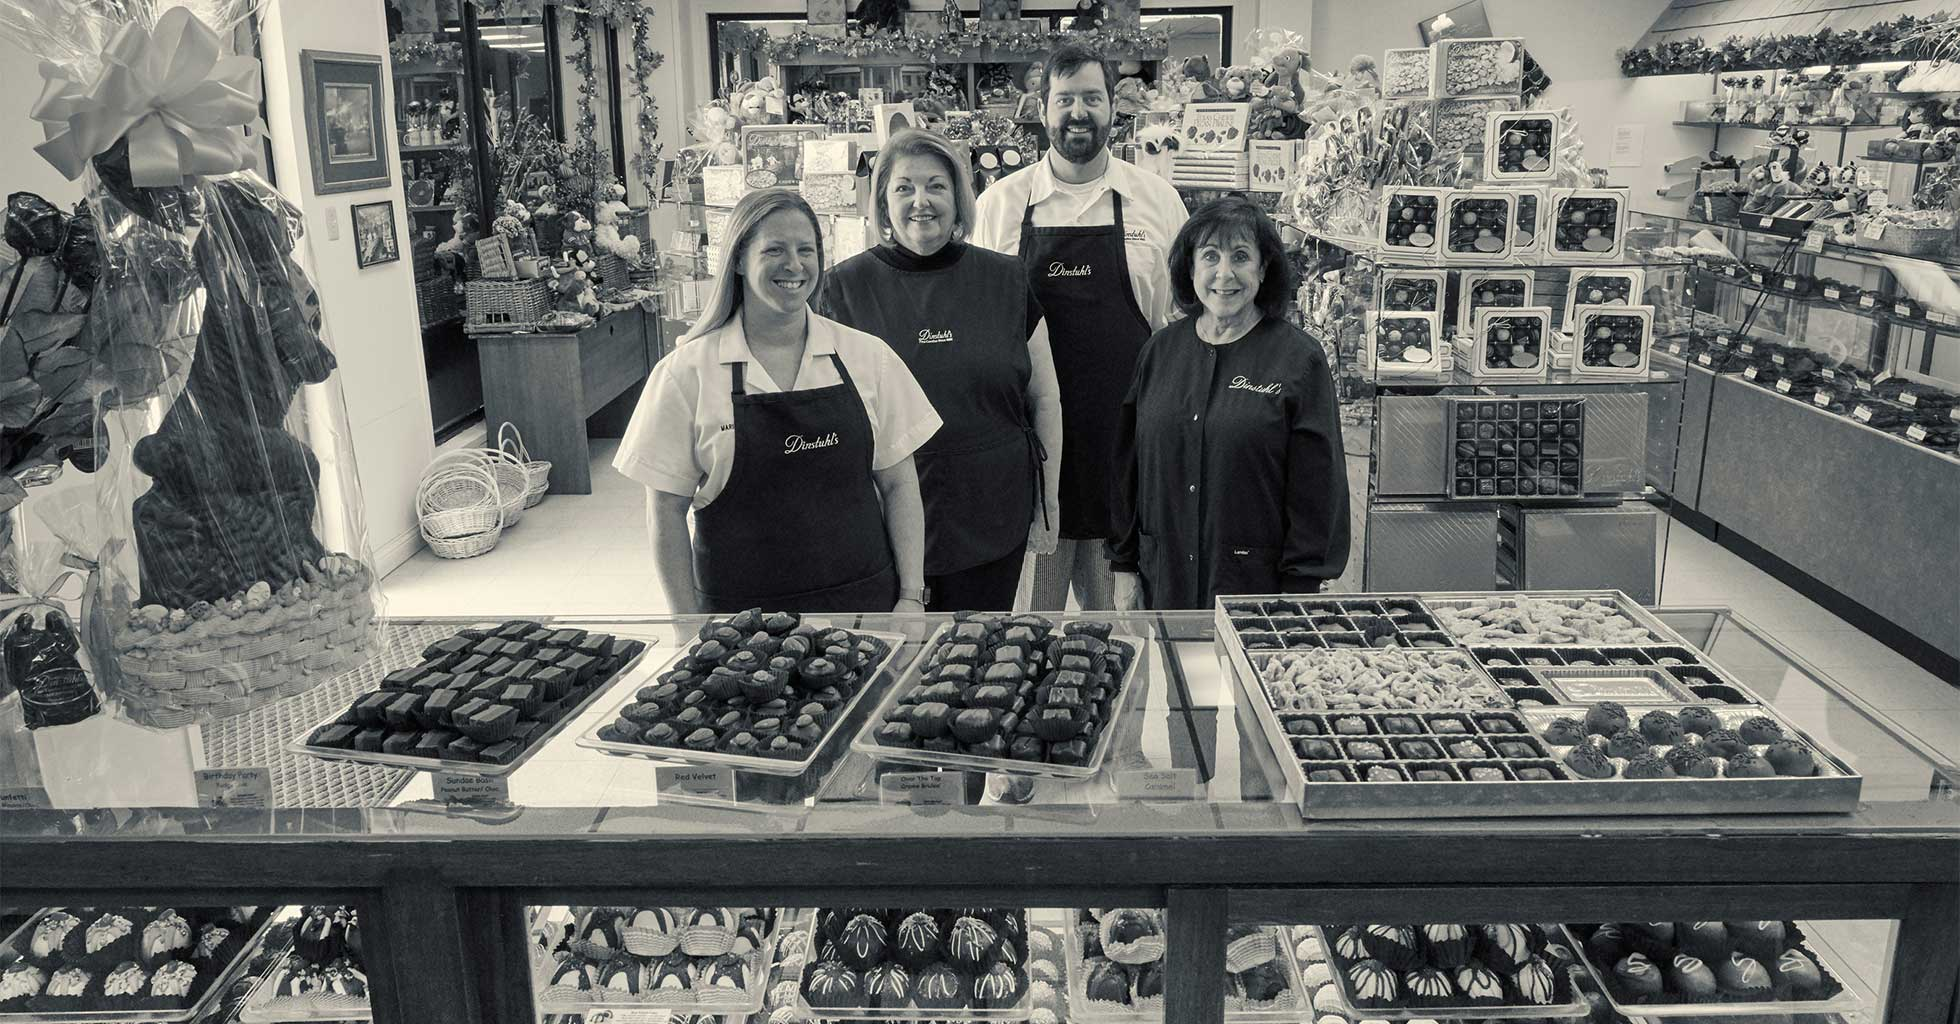 Dinstuhl's Fine Candy Company, Inc.